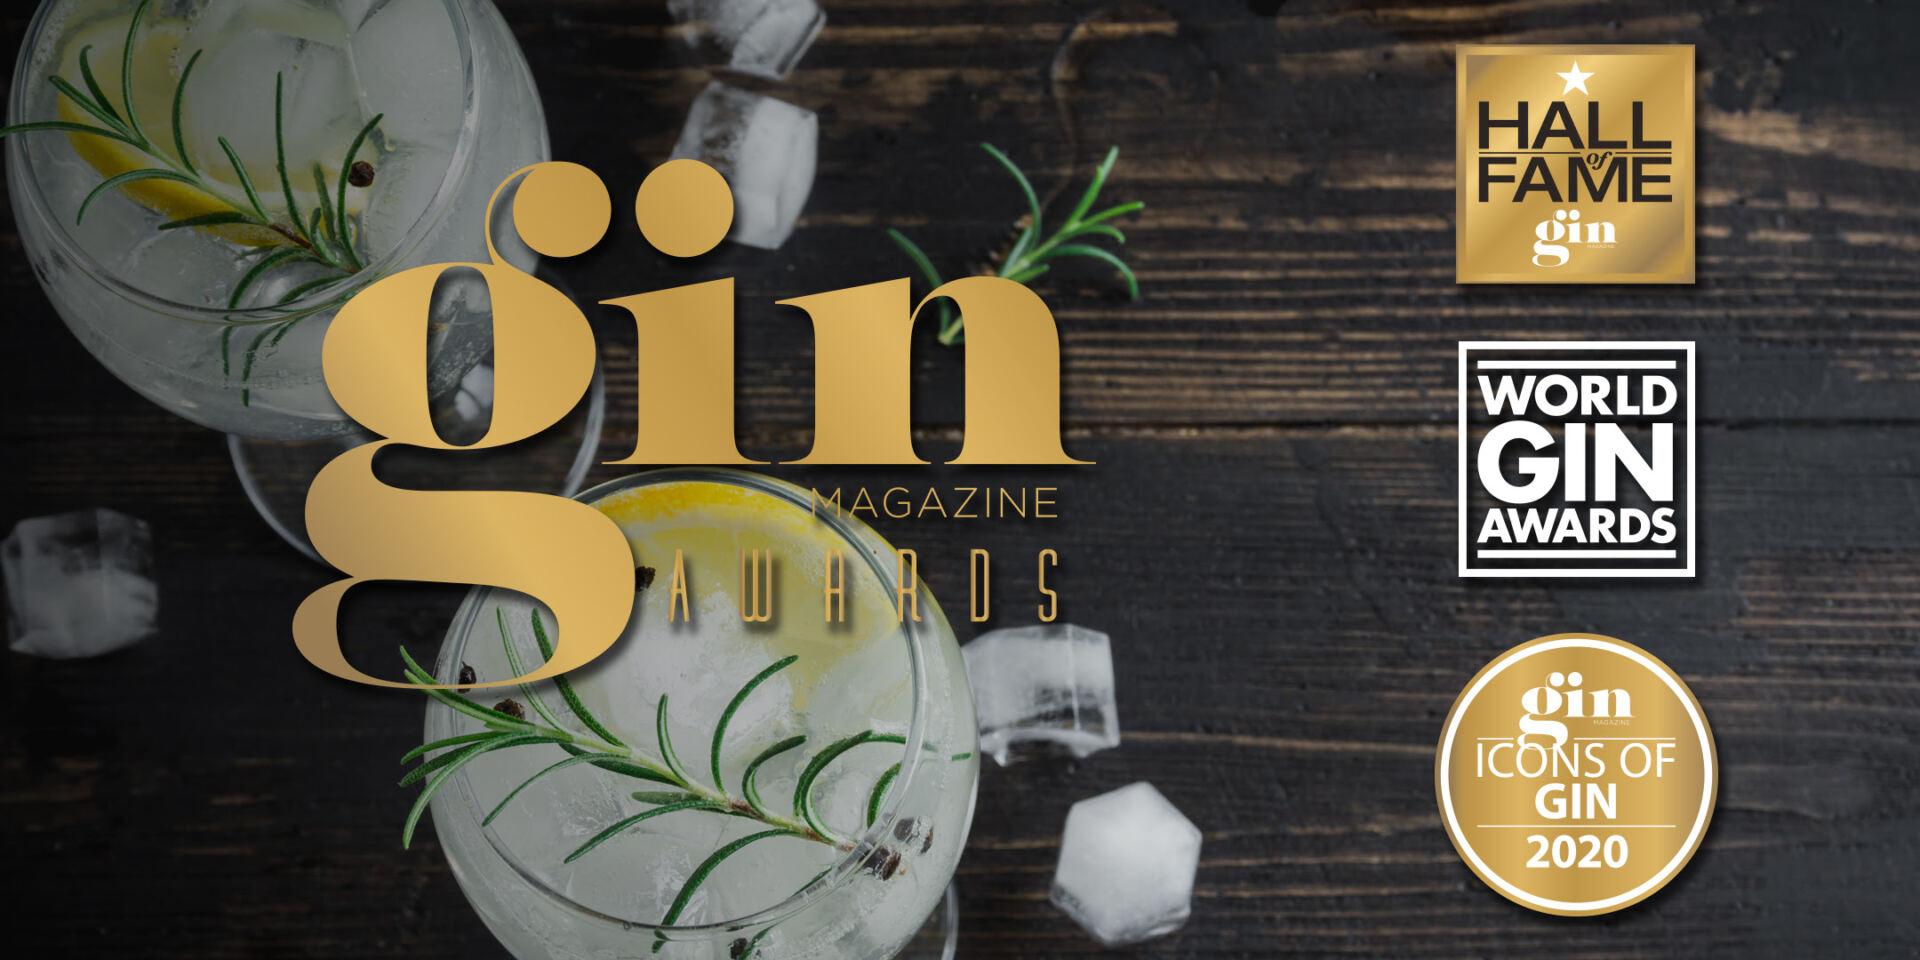 Ally receives Icons of Gin 2020 Award for Mataroa Gin marketing strategy